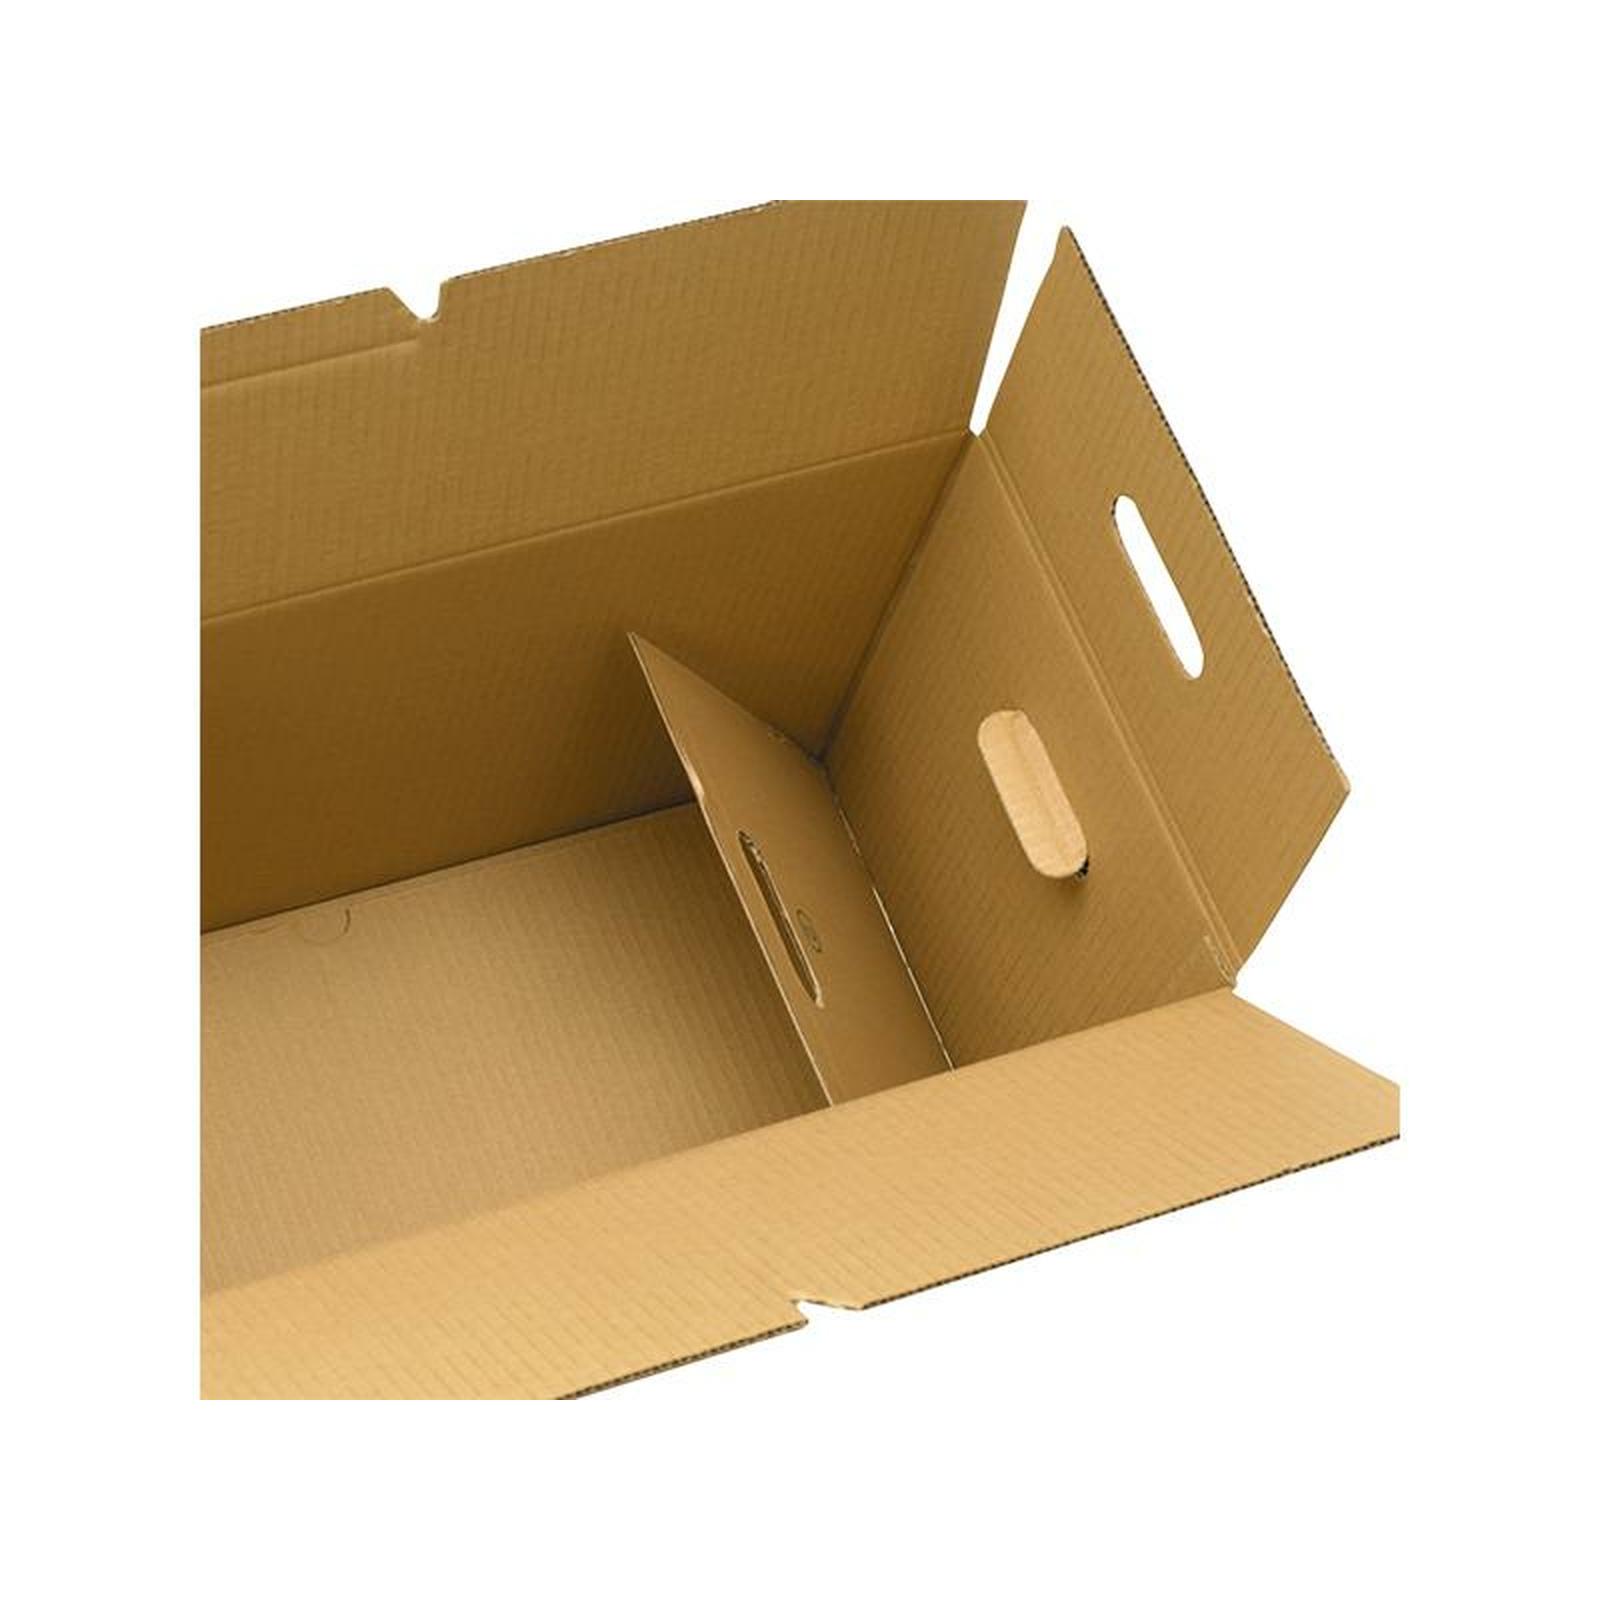 b cher transportbox 560x293x330 mm g nstig kaufen 1 95. Black Bedroom Furniture Sets. Home Design Ideas